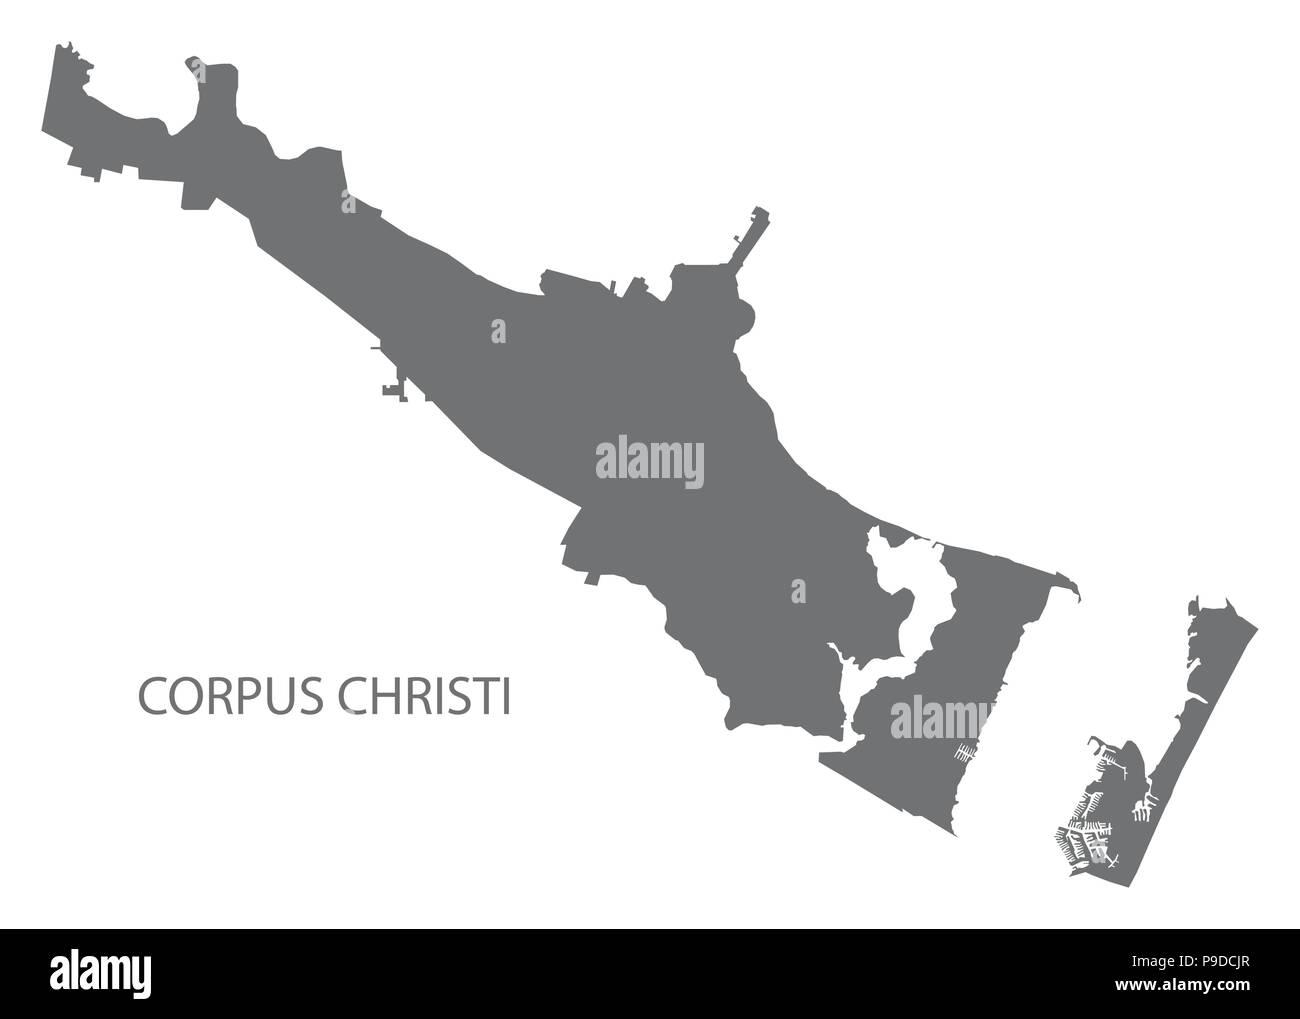 Corpus Christi Texas city map grey illustration silhouette shape - Stock Vector